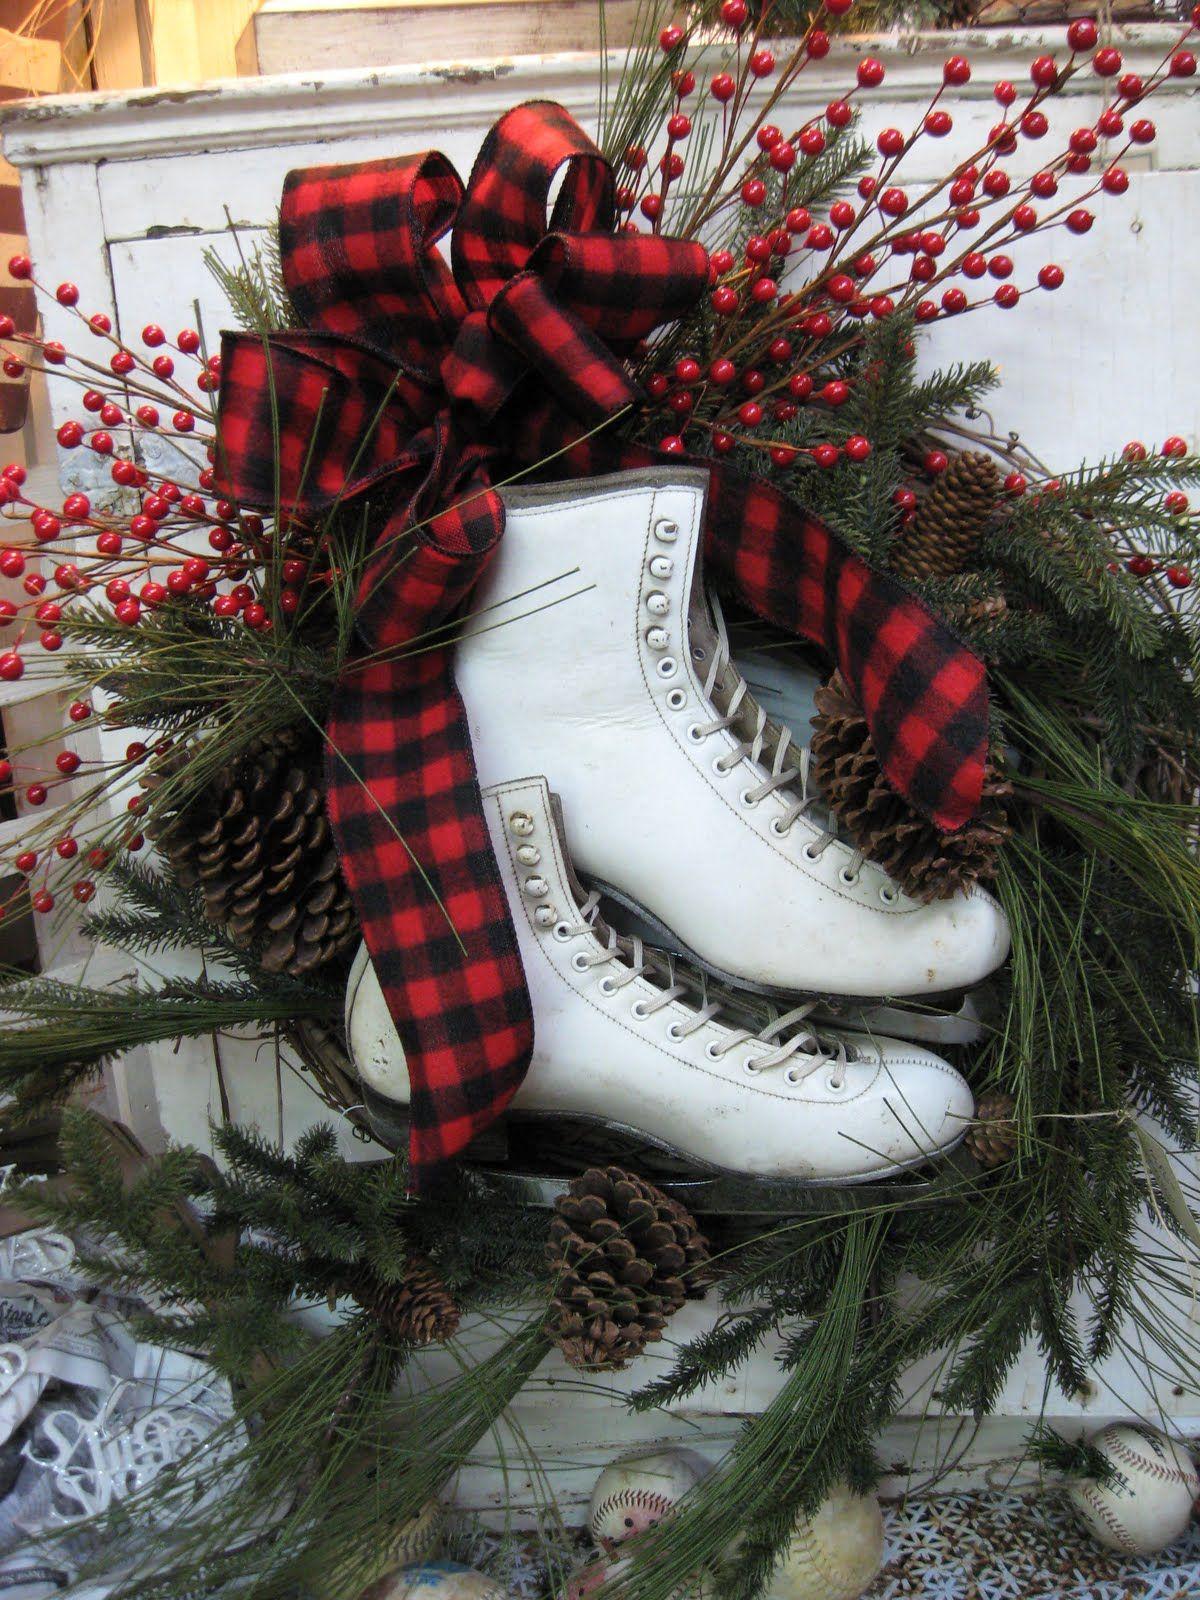 Originales ideas para decorar en navidad christmas ideas pinterest wreaths tossed and - Ideas originales para decorar en navidad ...